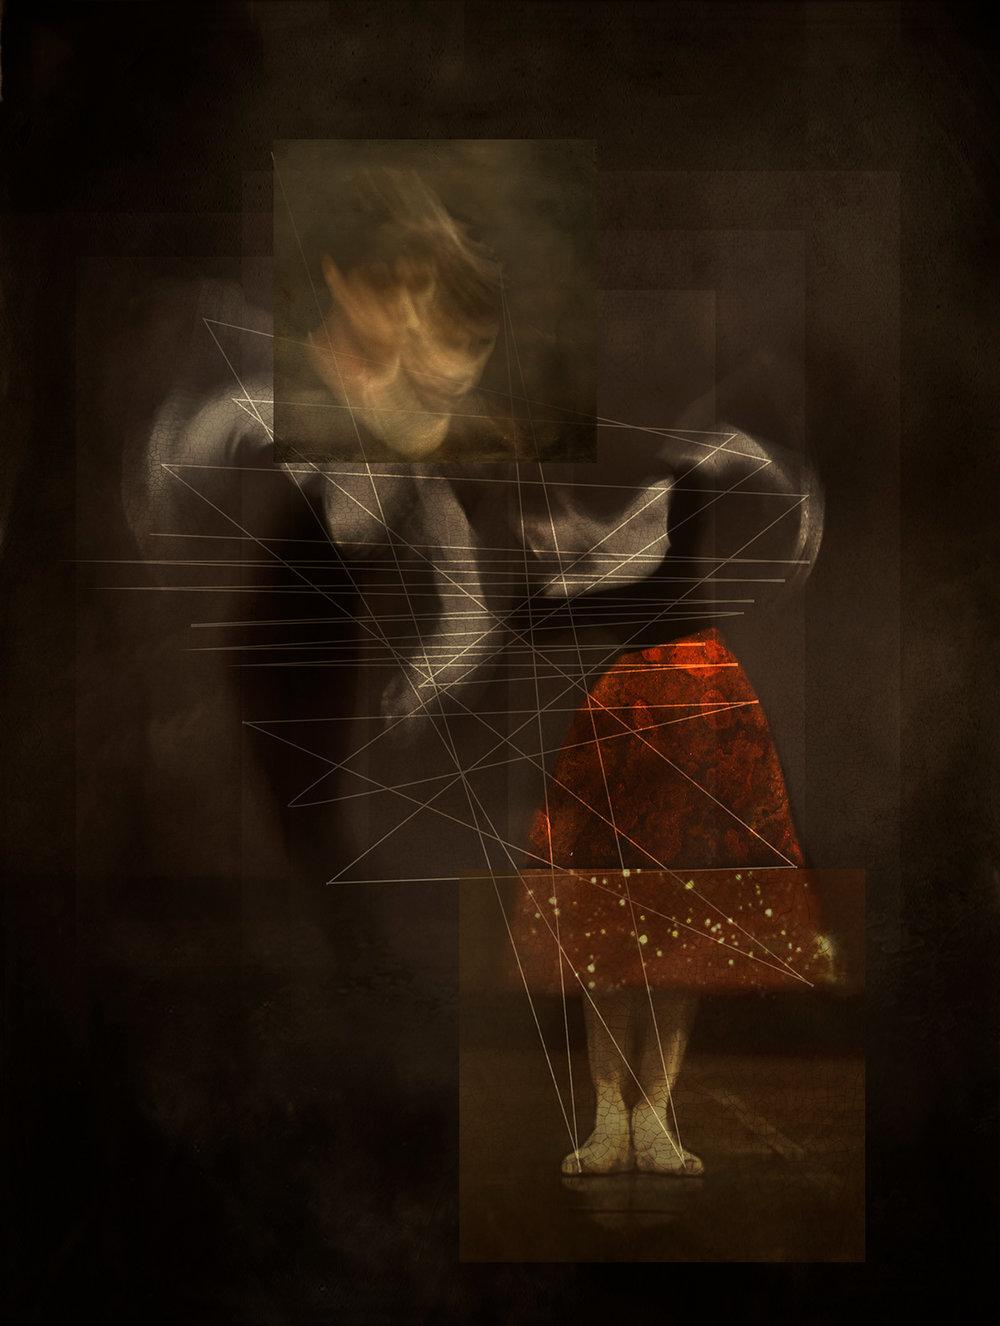 Eduardo_Fujii_Uncertain-Nature-of-Reality_Entanglement_04.jpg